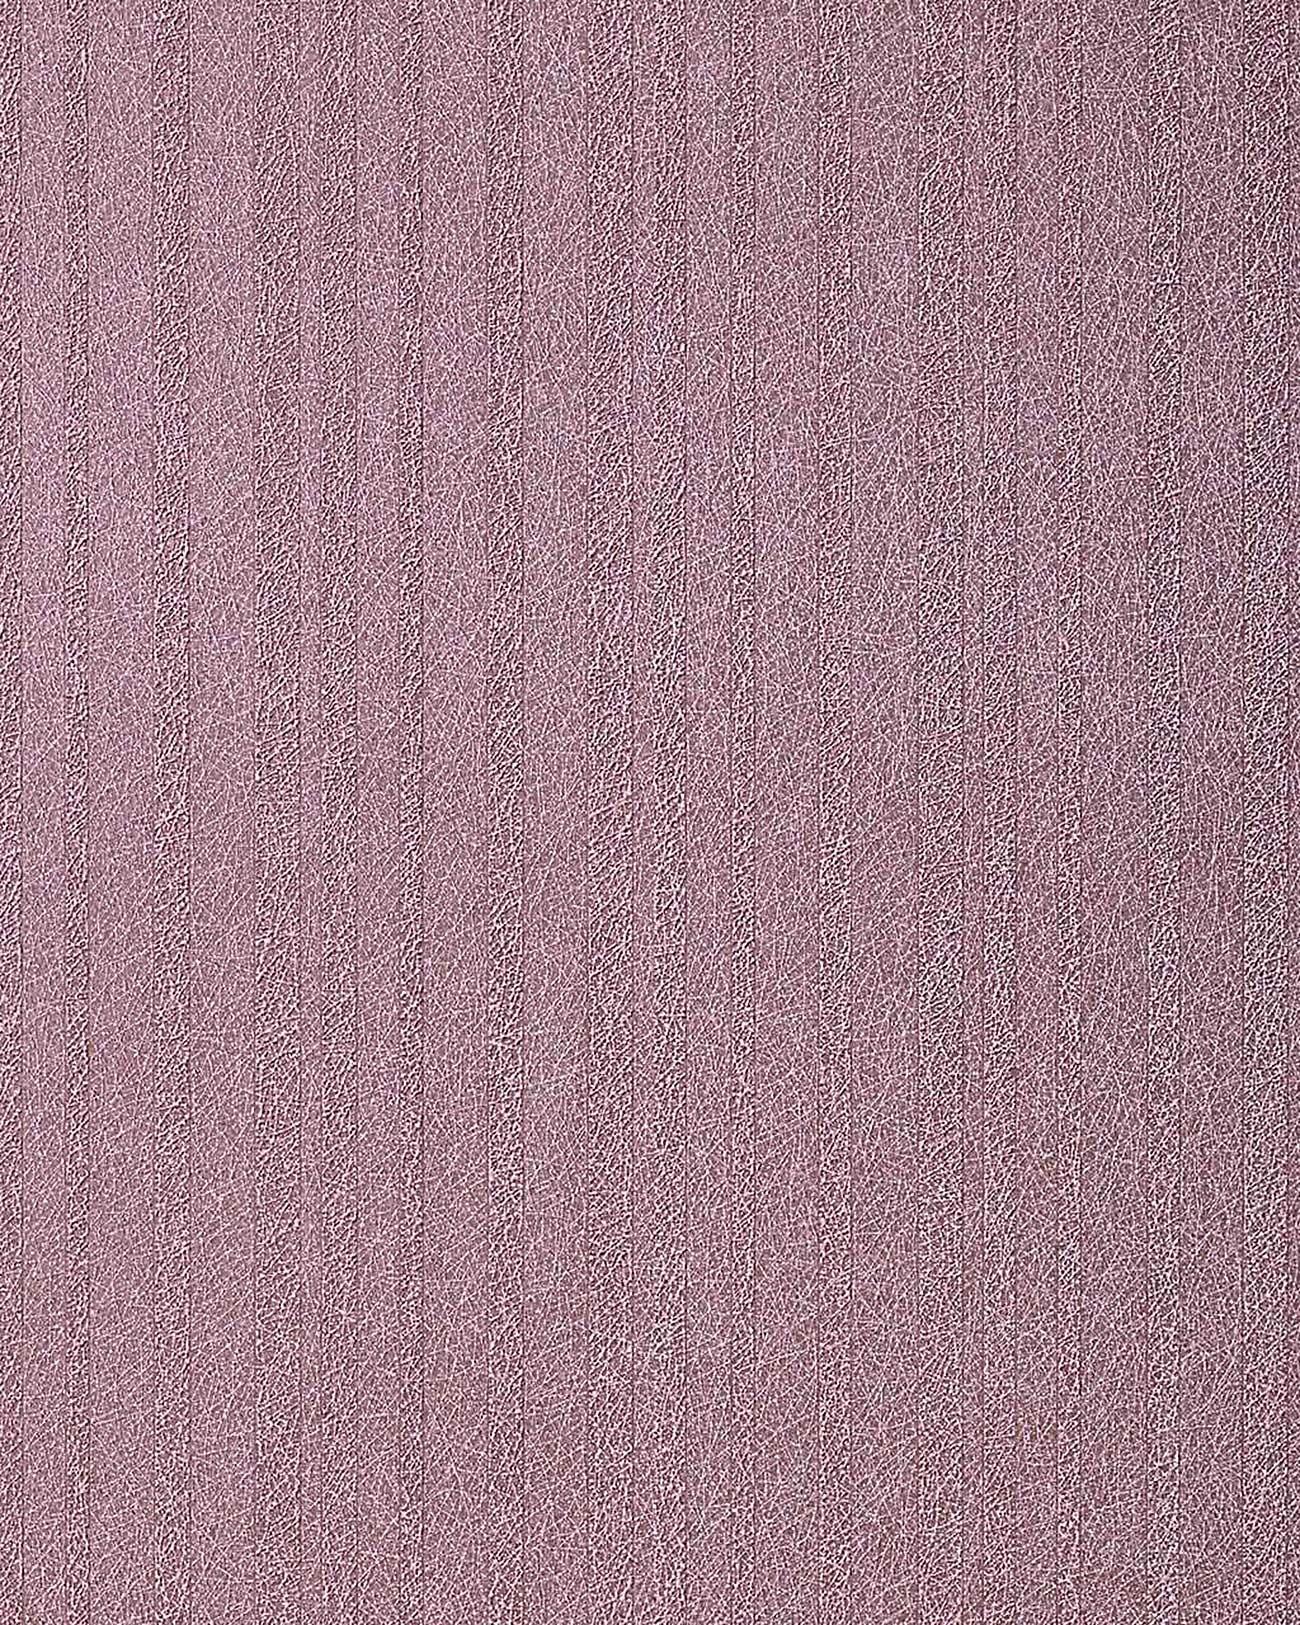 Papel pintado unicolor edem 1015 14 moderno con textura de rayas en violeta lavanda morado - Papel pintado con textura ...